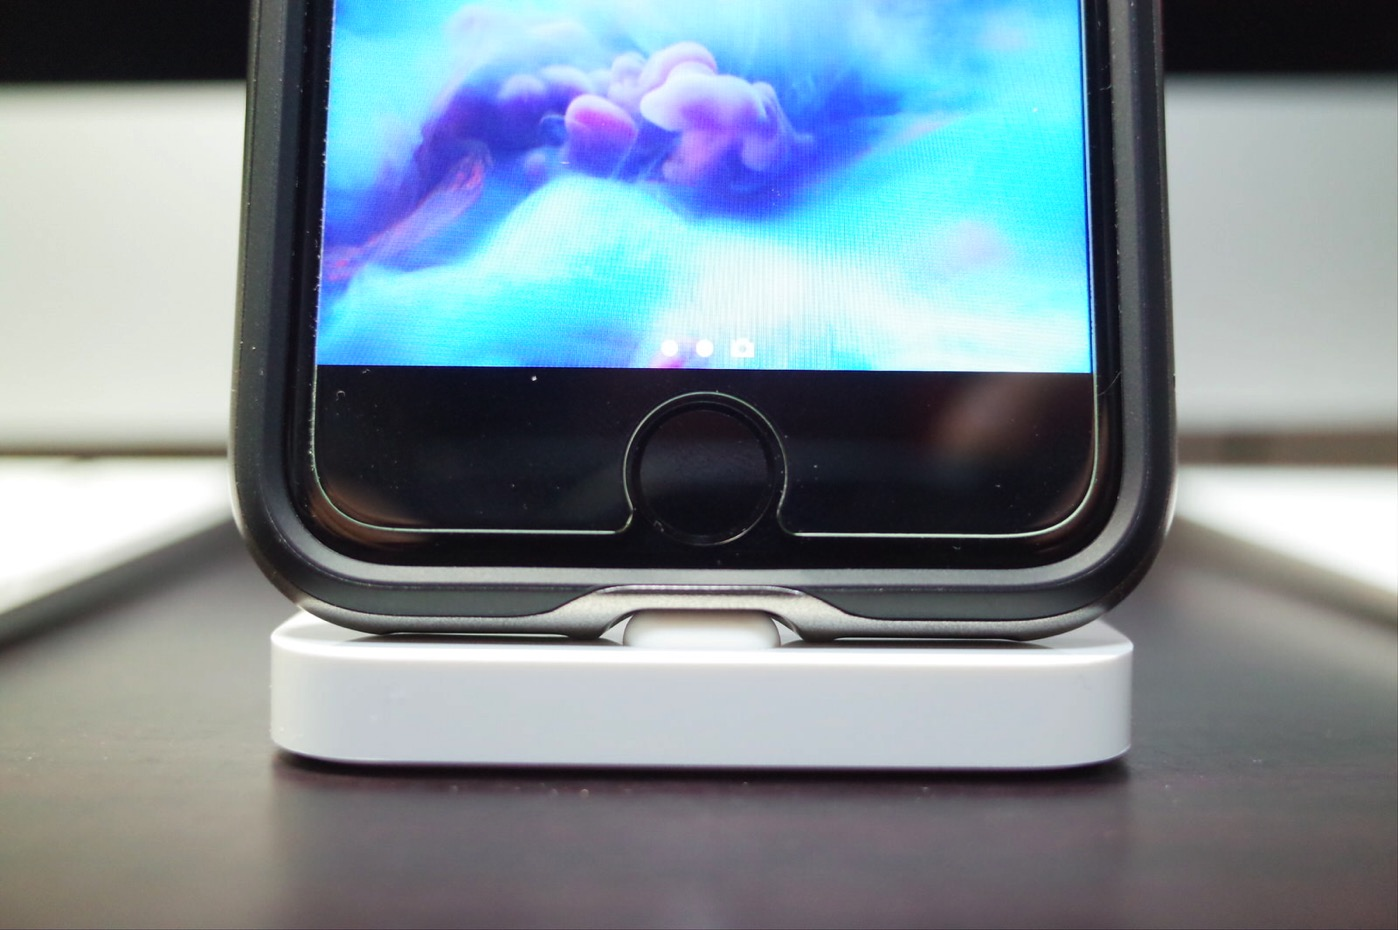 【Spigen】 iPhone7 ケース, ネオ・ハイブリッド [ 米軍MIL規格取得 二重構造 バンパー ] アイフォン 7 用 カバー (iPhone7, ガンメタル)-6